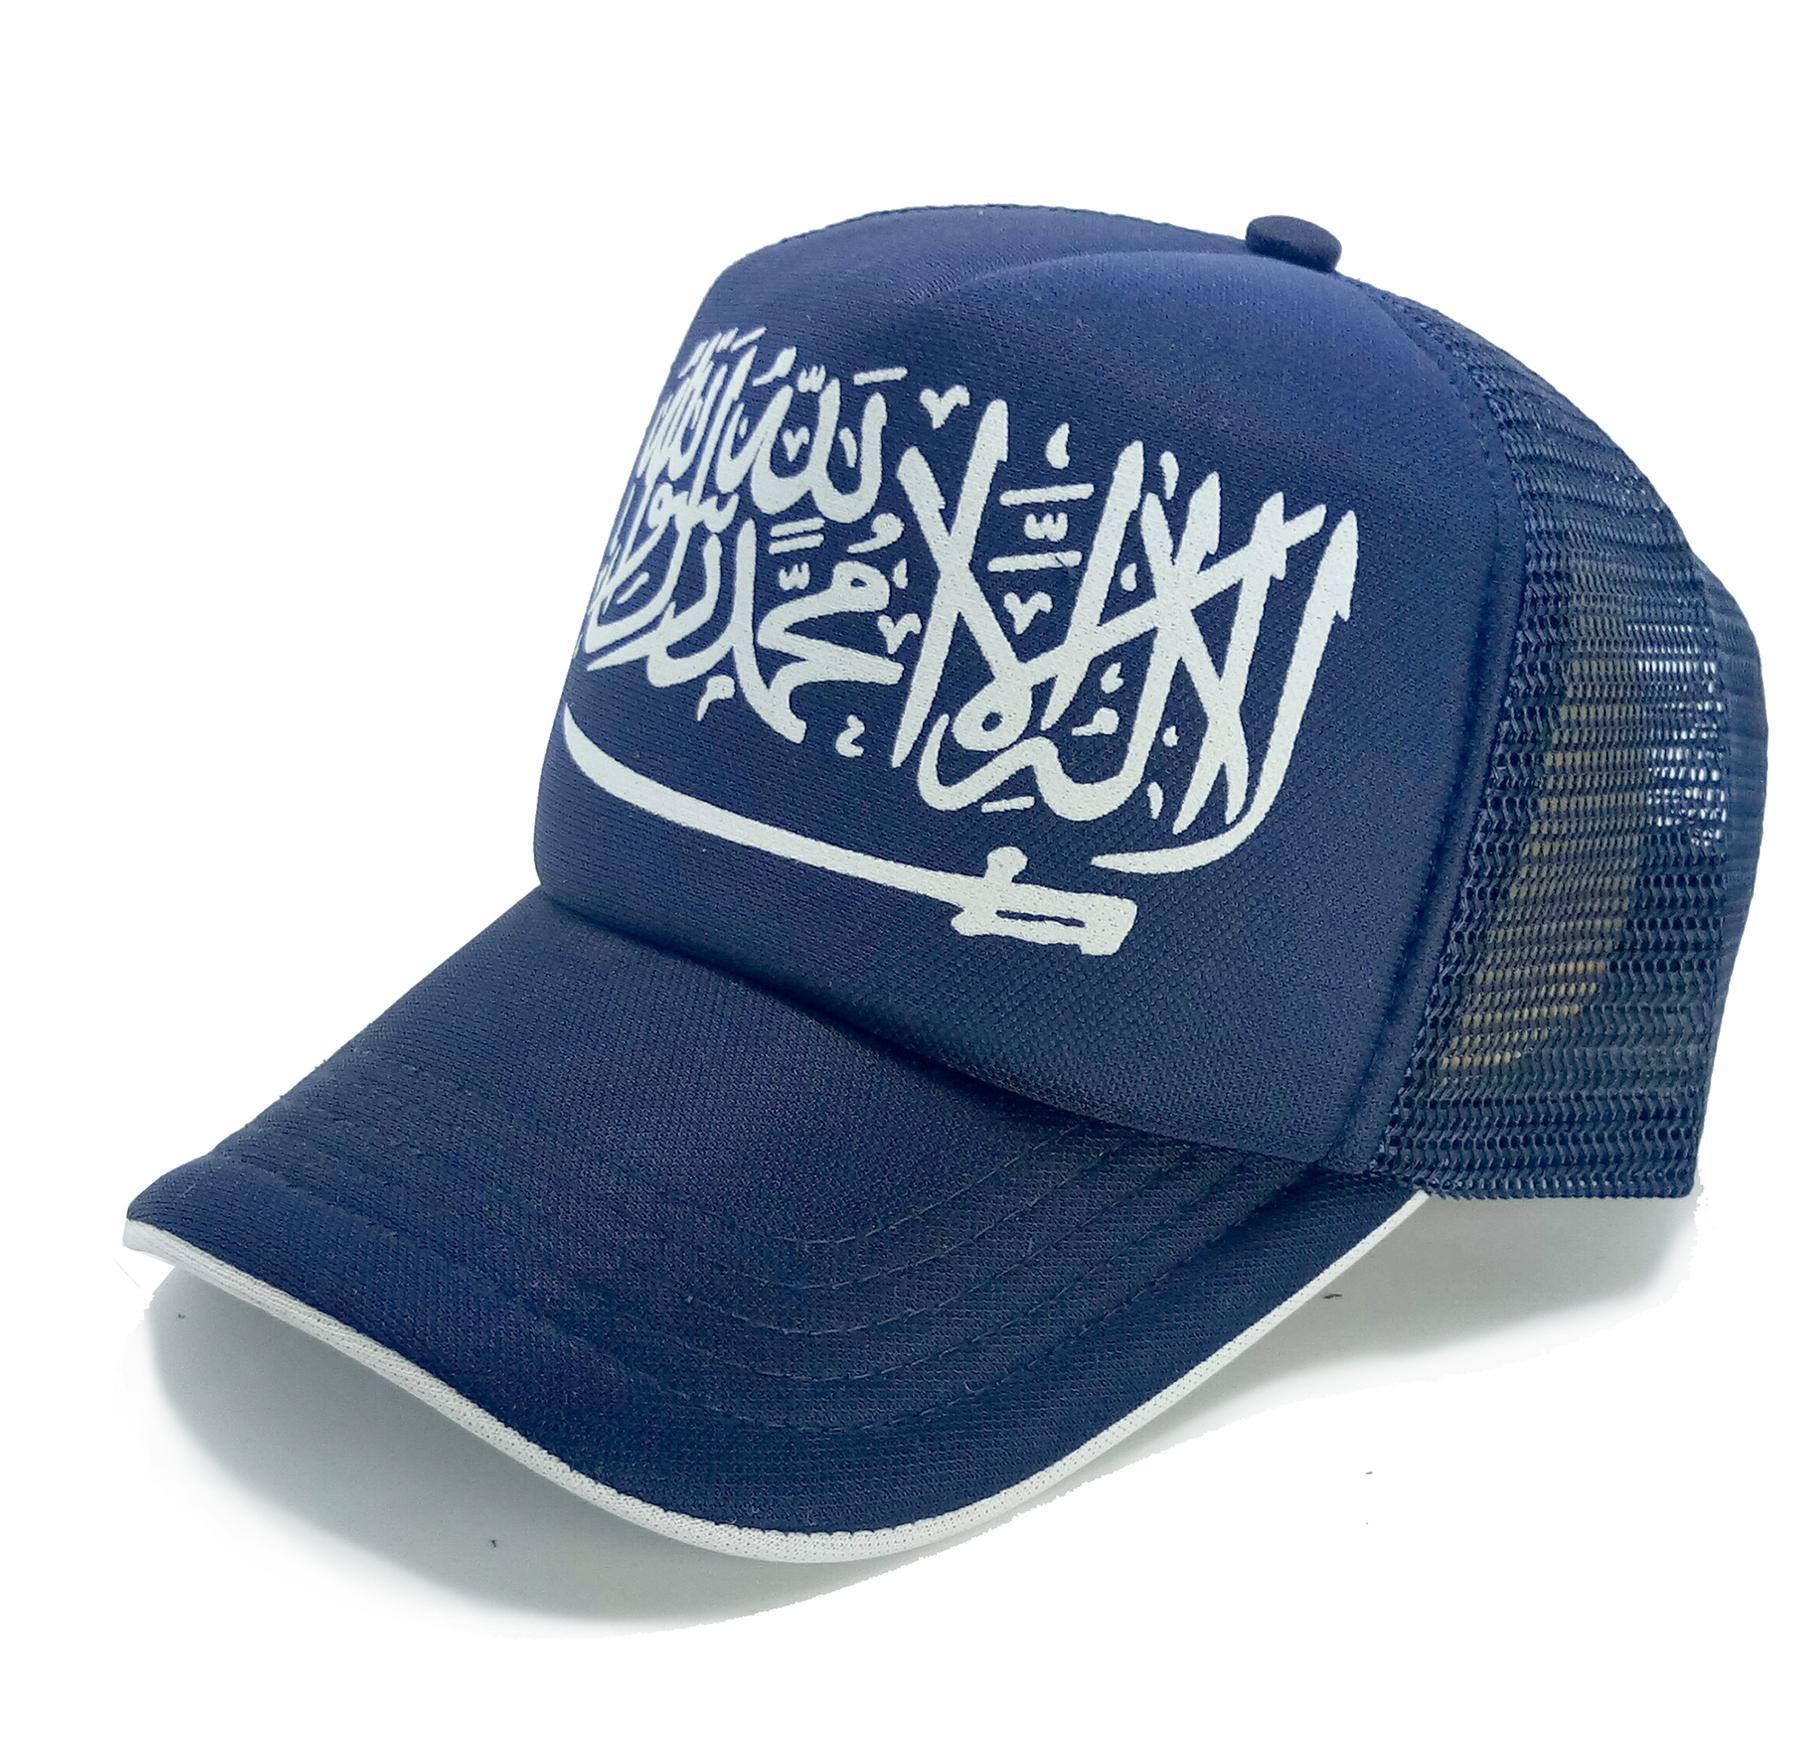 produsen topi surabaya